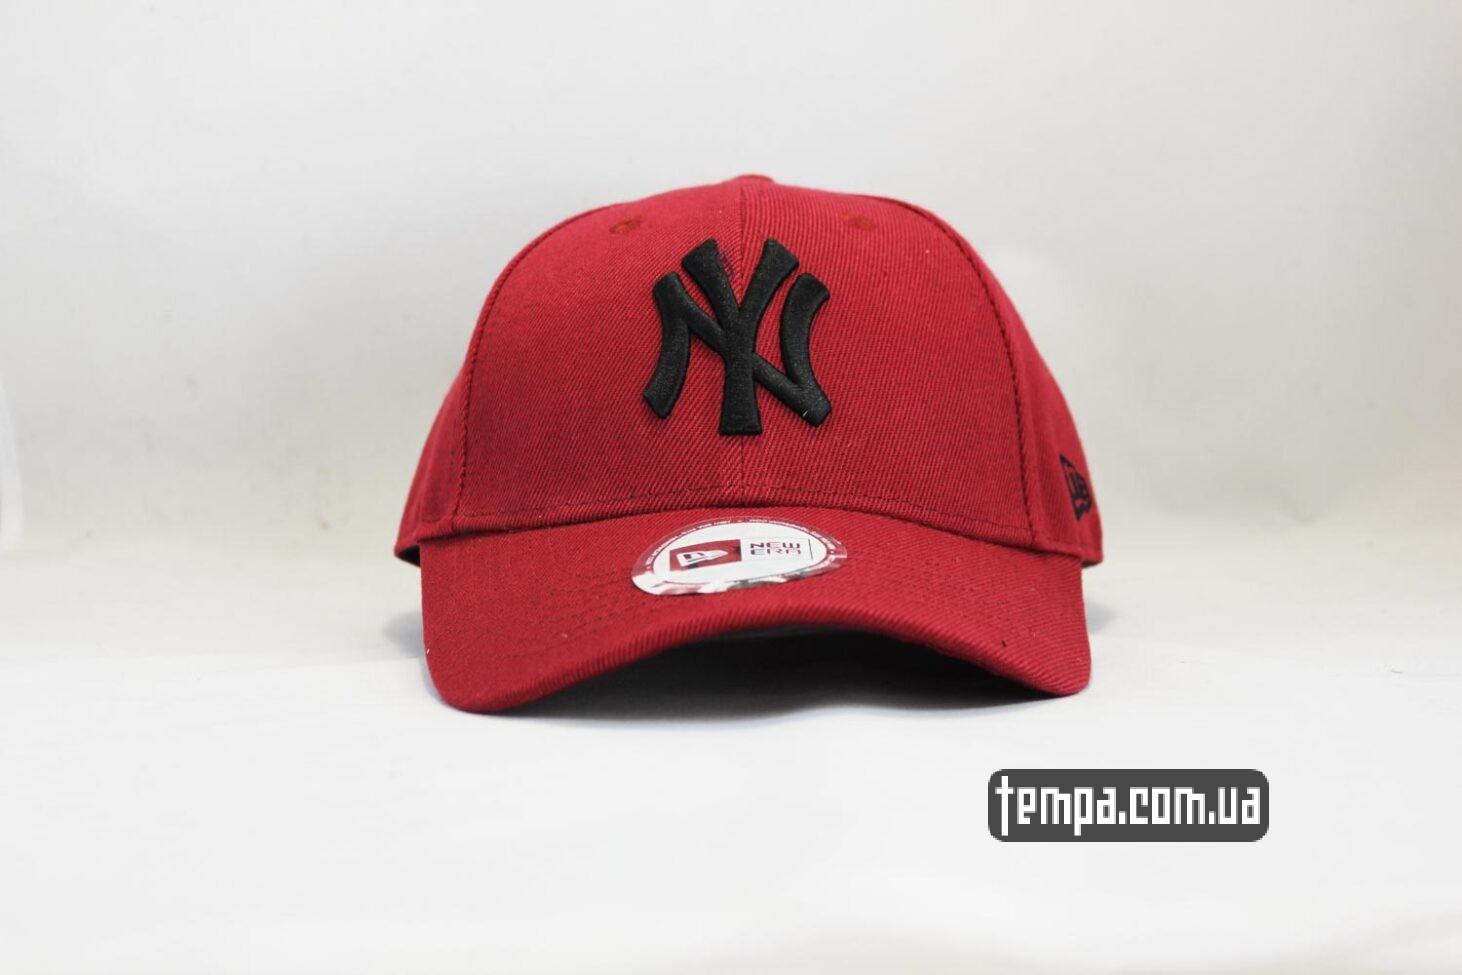 кепка бейсболка Янки Yankees New York New Era красая